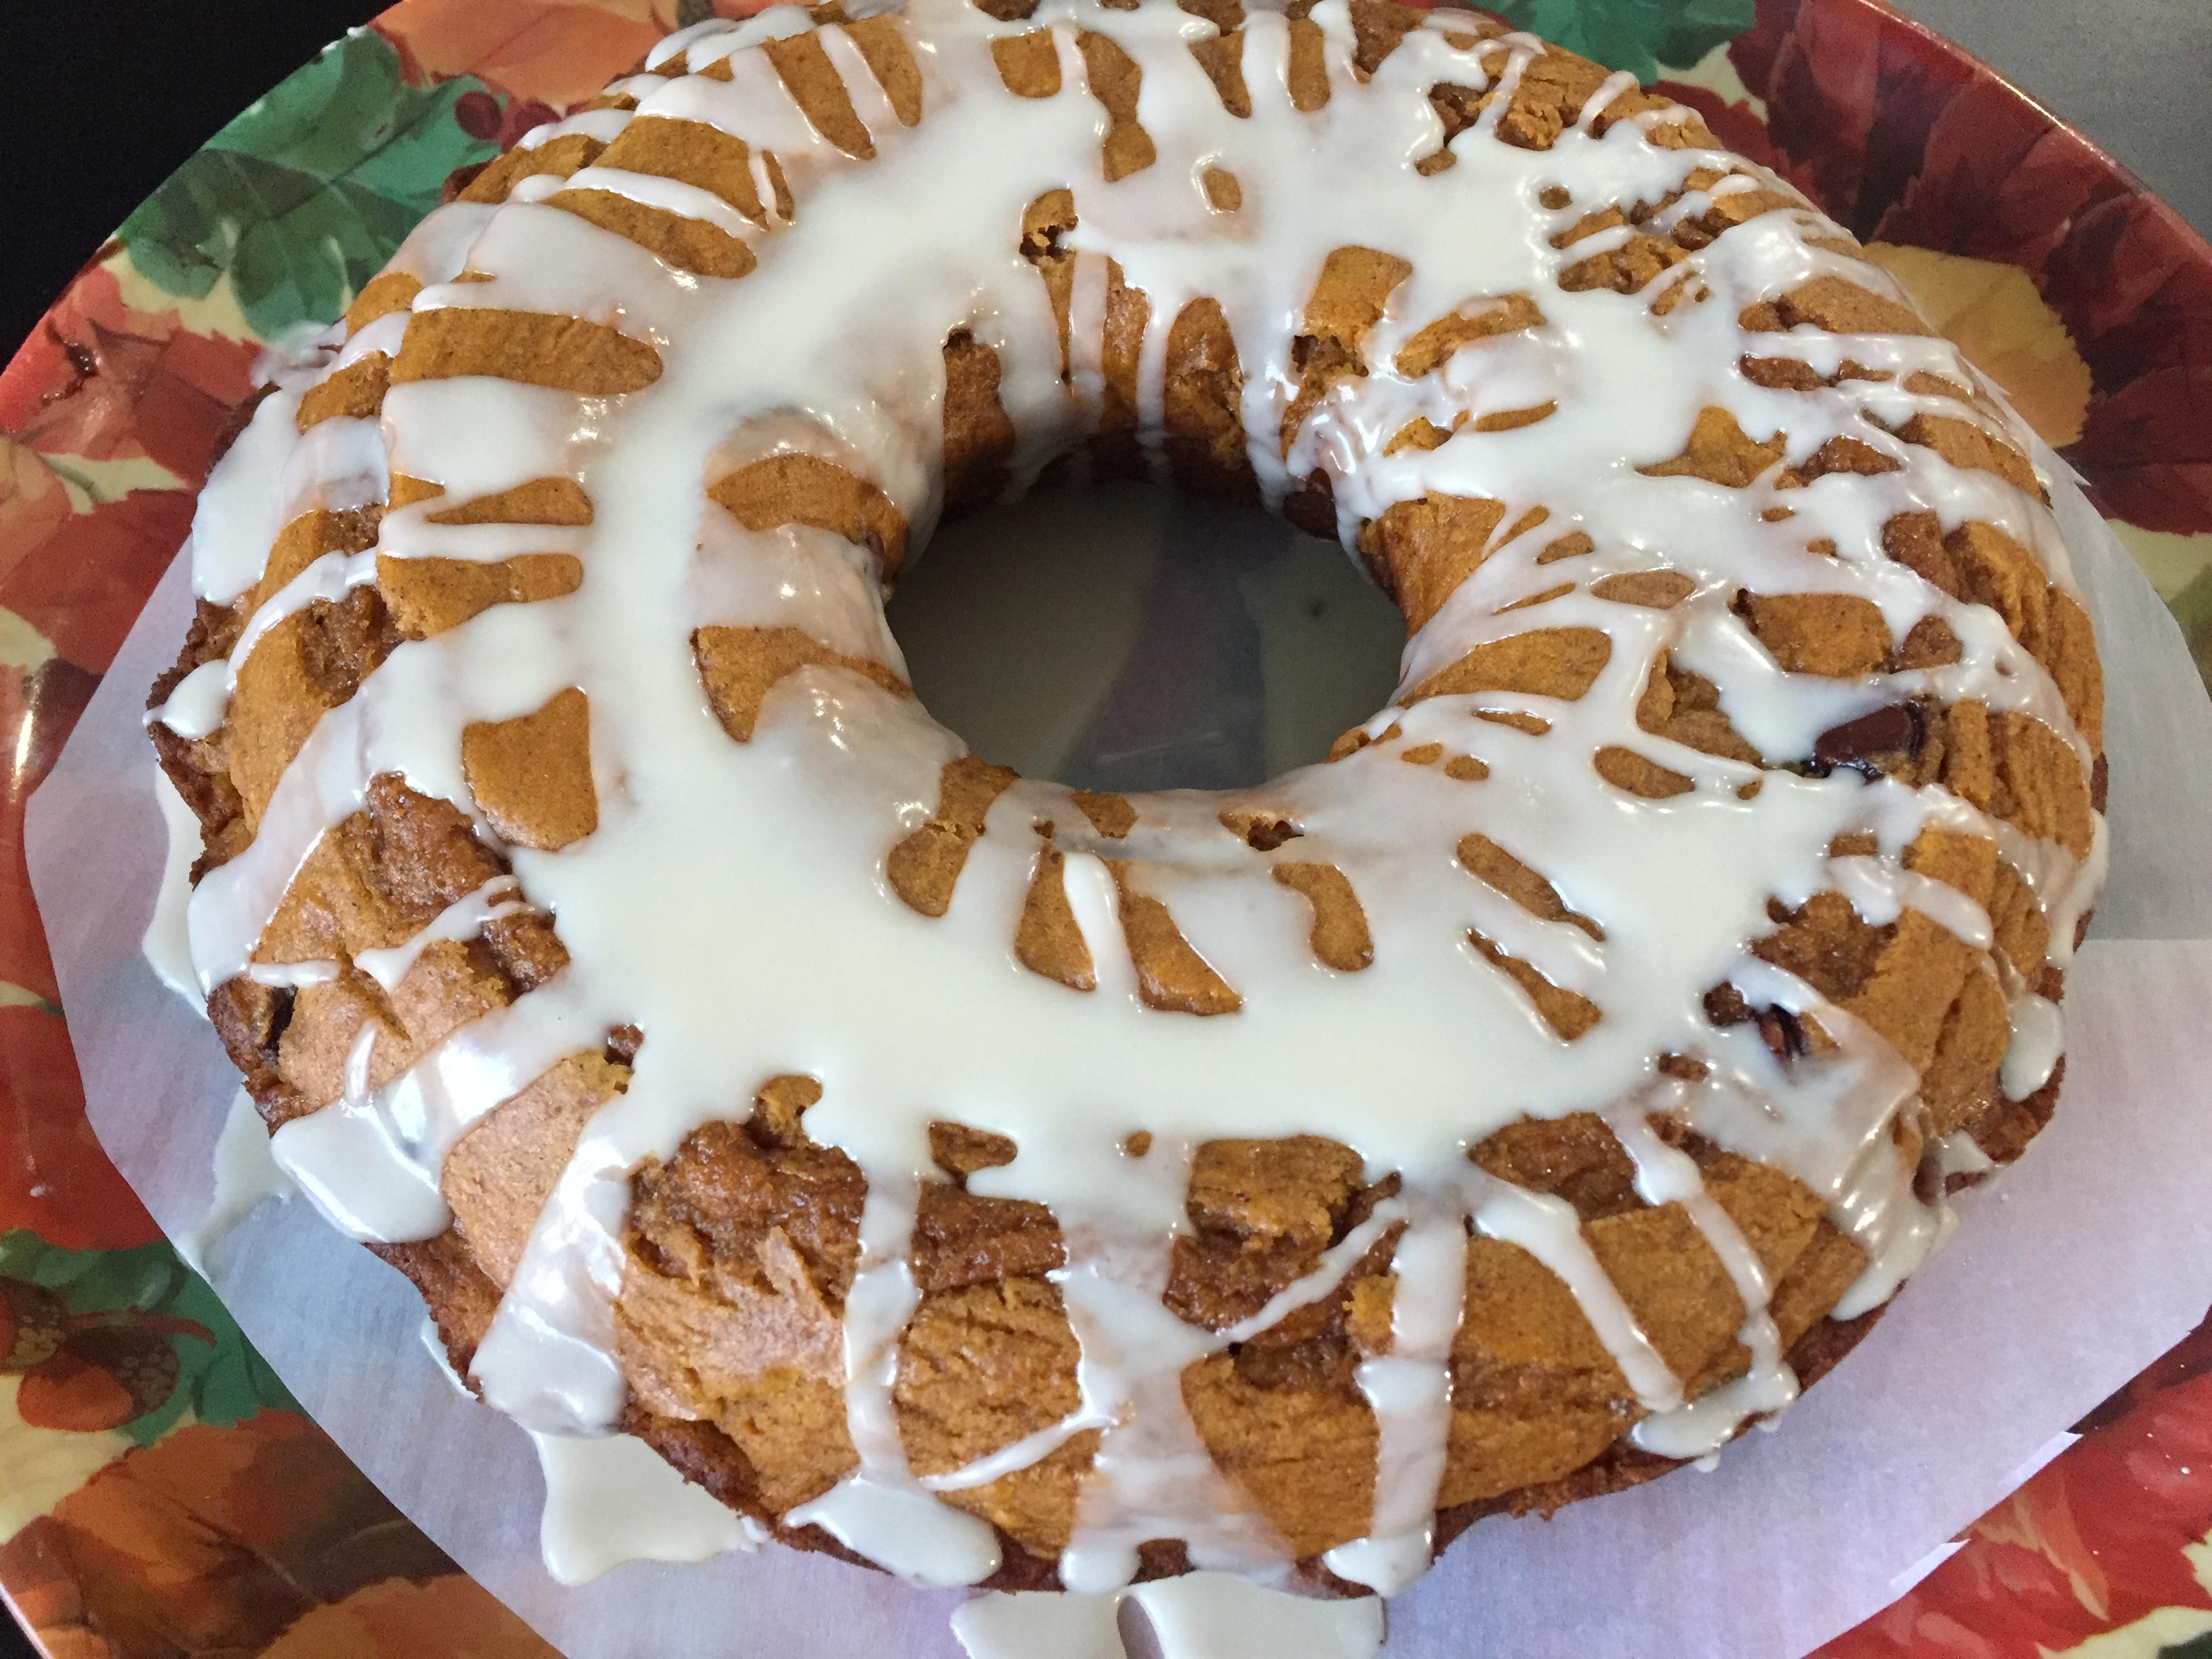 Vanilla Sugar Icing Glaze